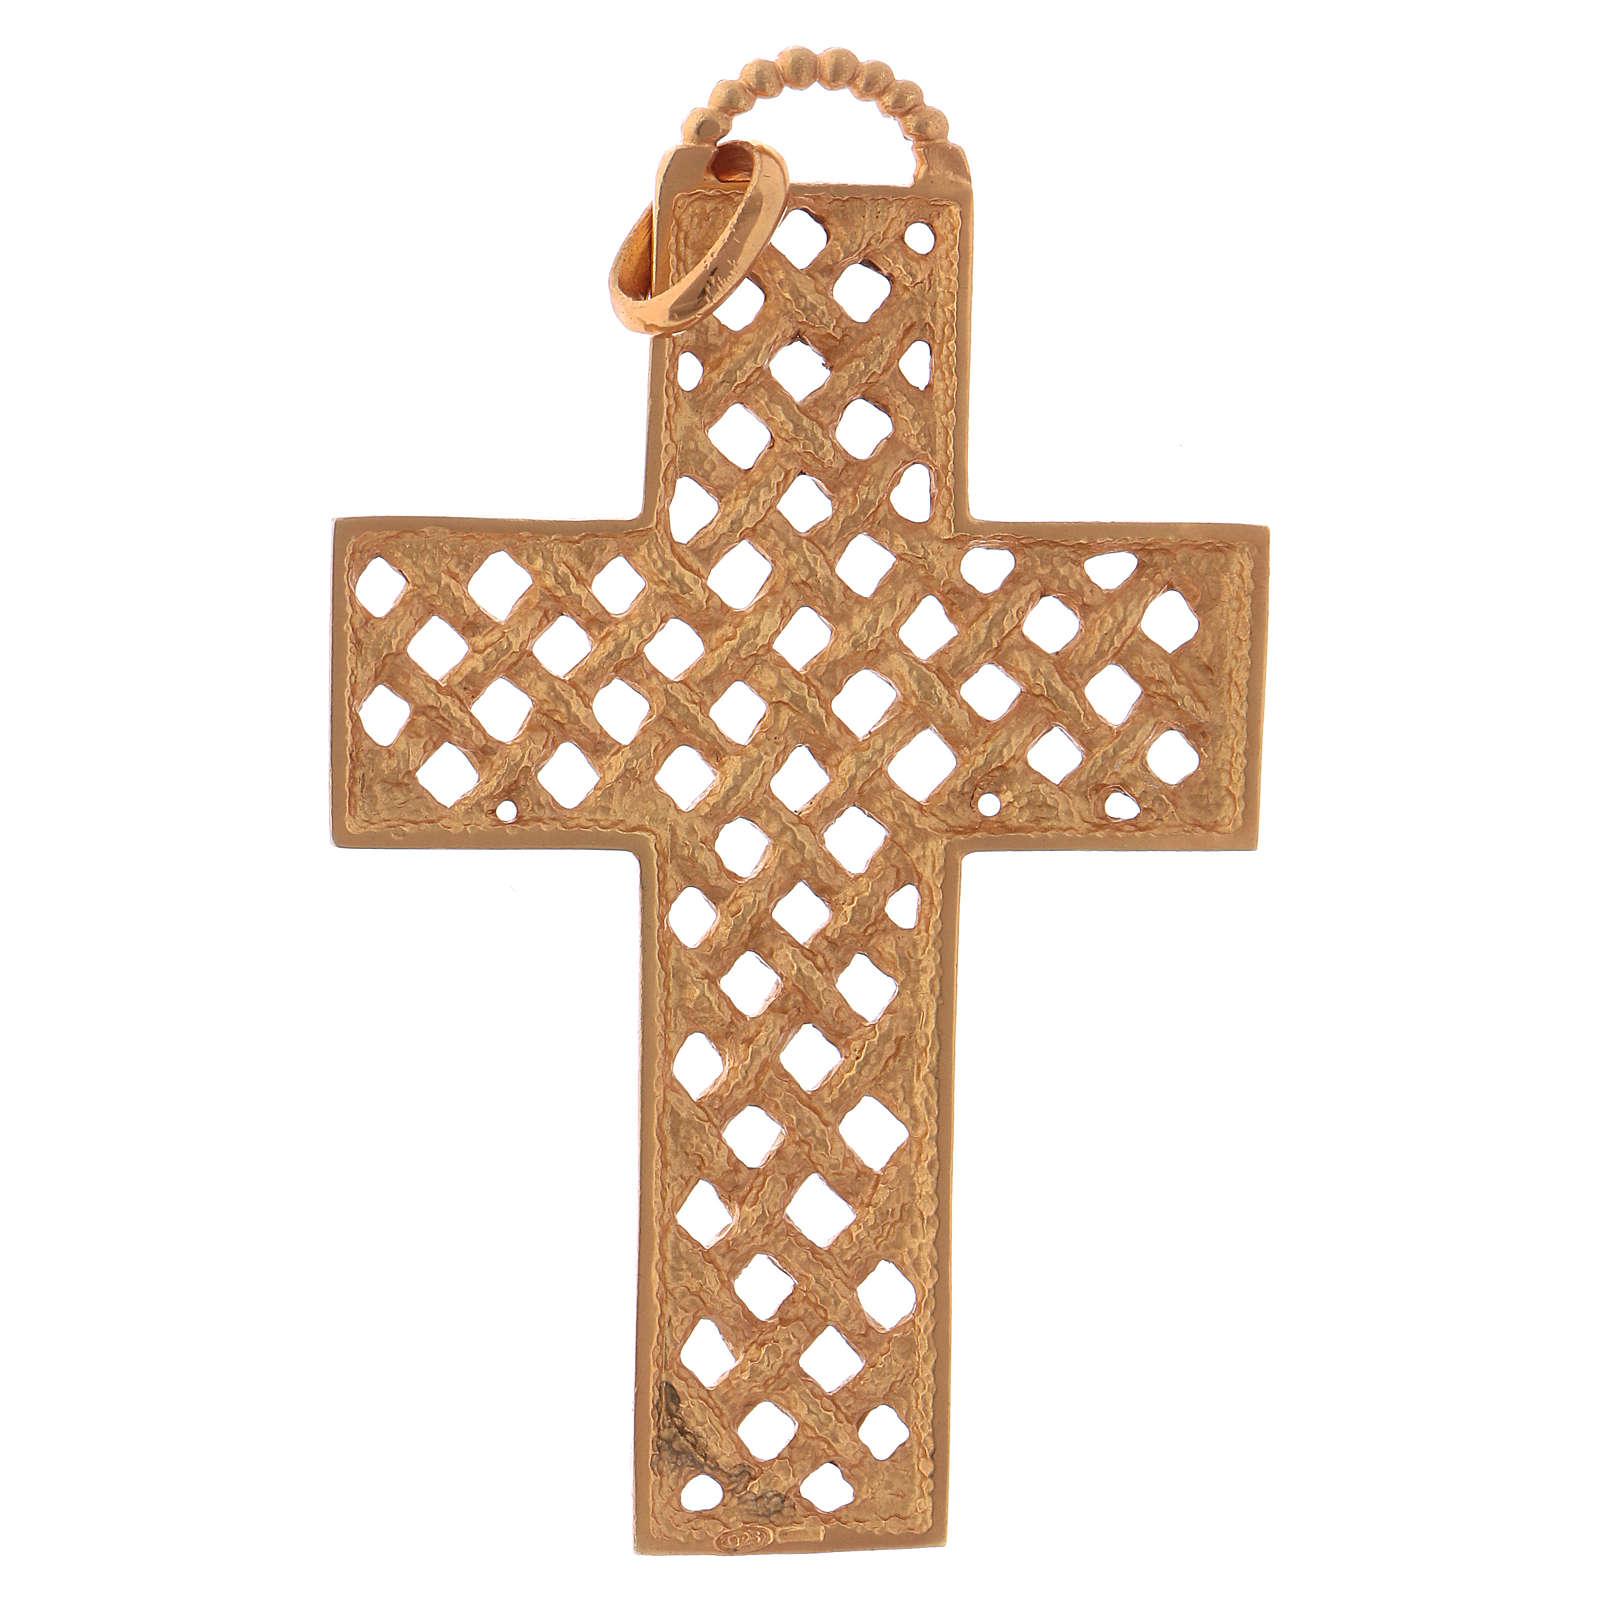 Cruz pectoral entrelazada plata 925 dorada 3